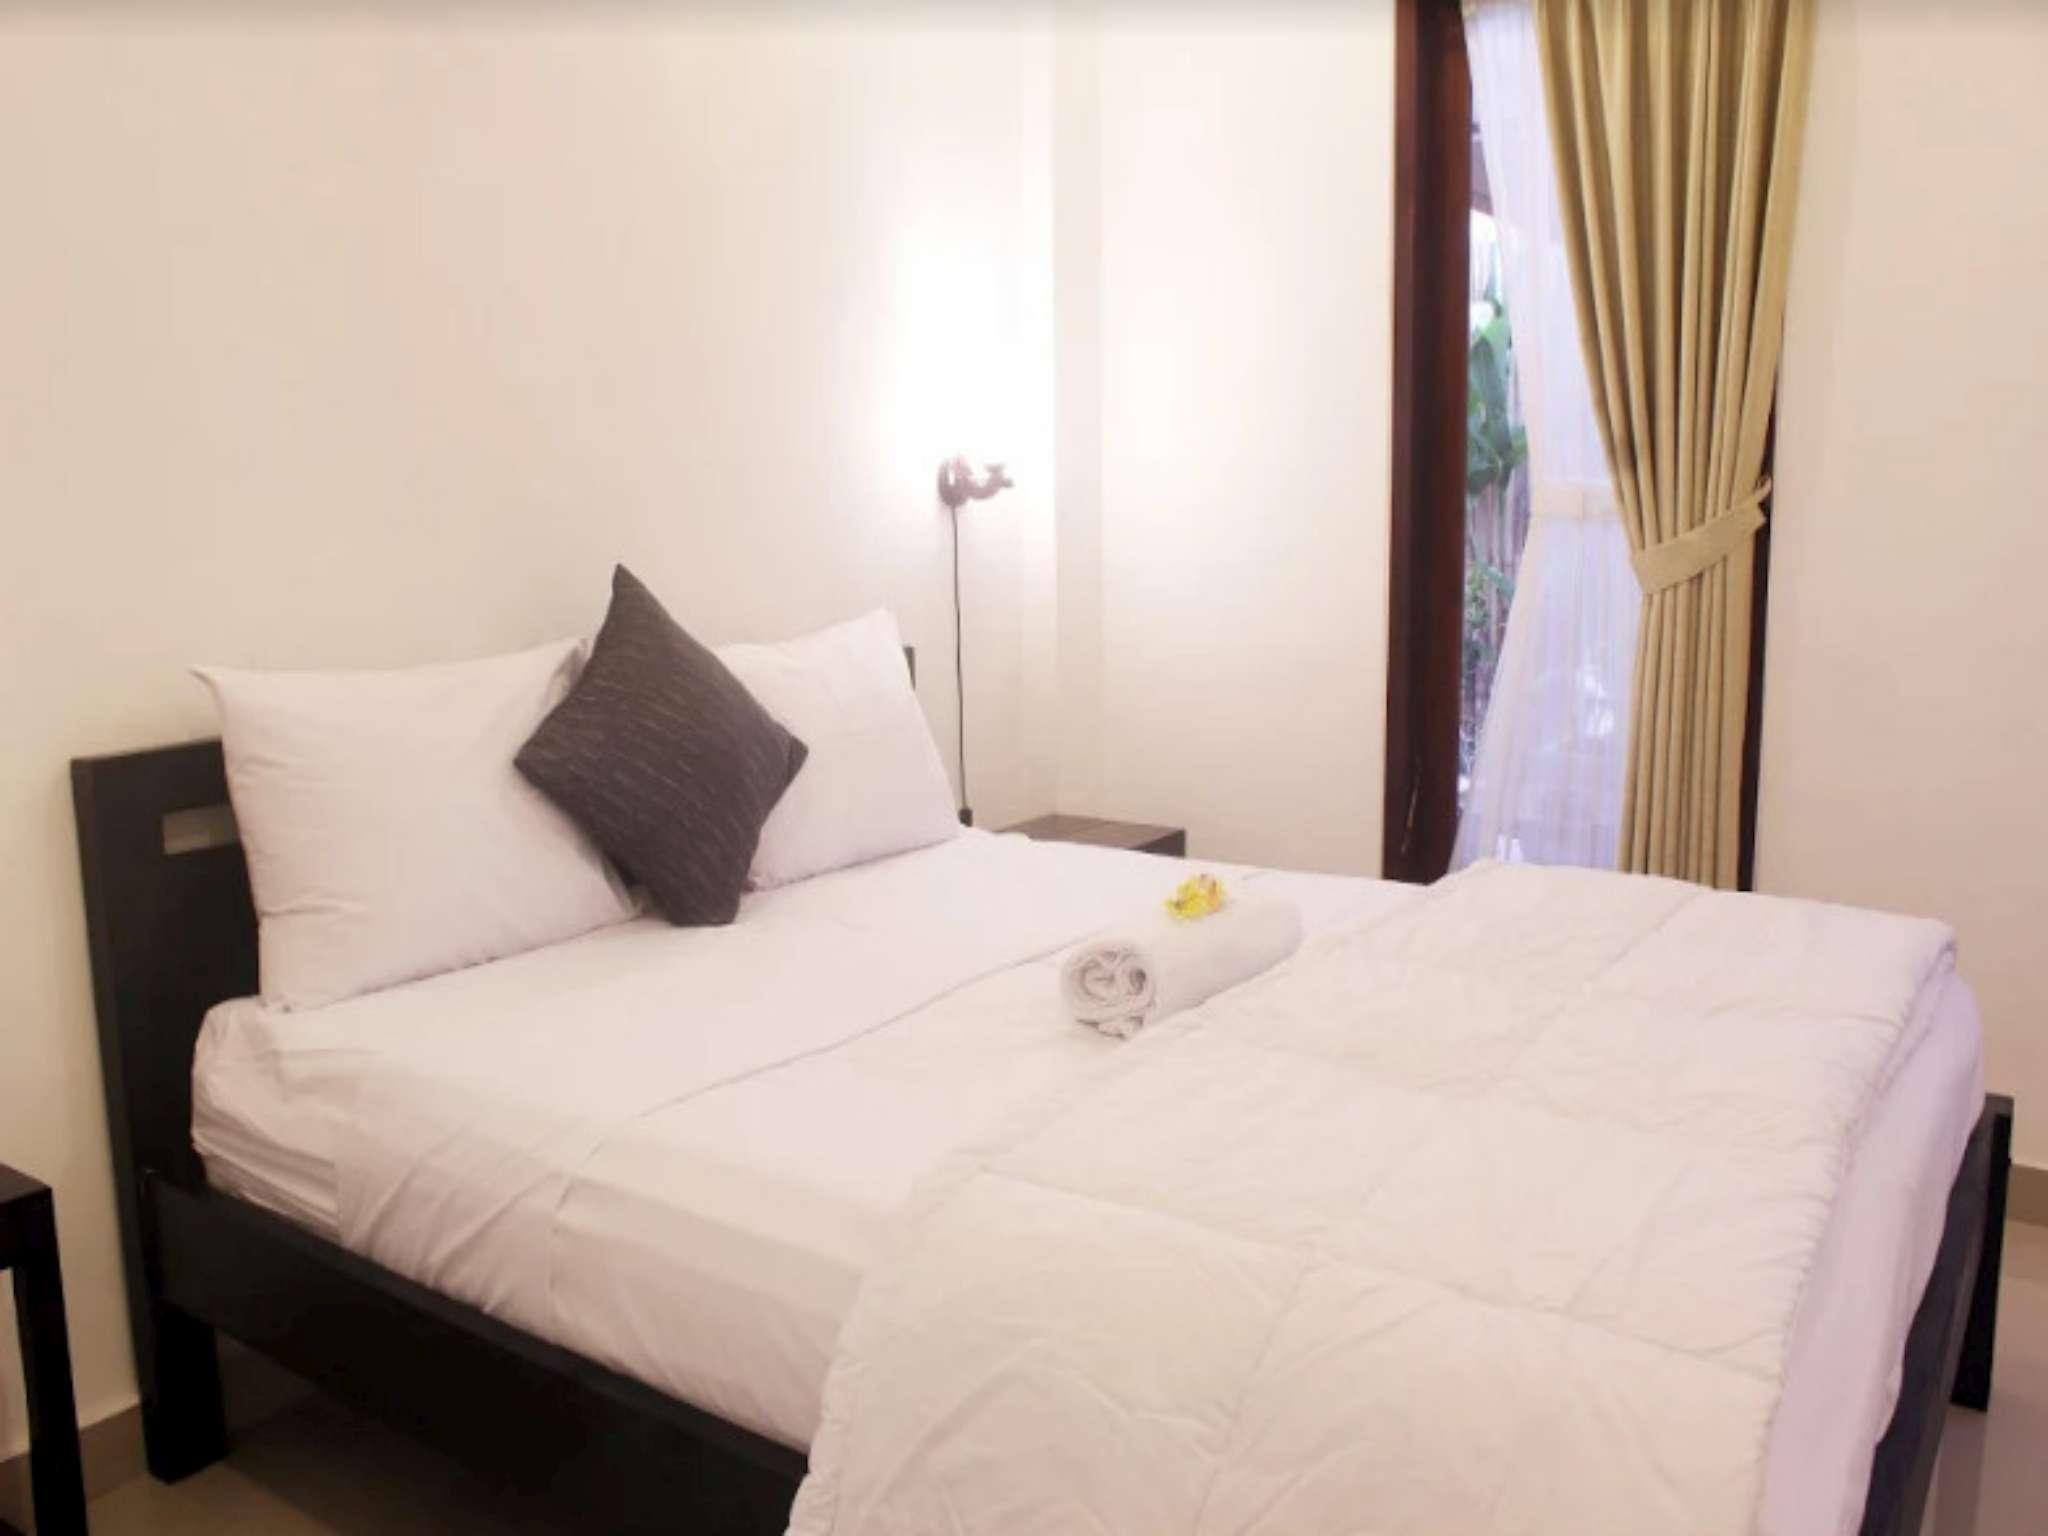 Hotel Kubu Yogi Homestay - Jl Pantai Batu Bolong No. 62 - Bali